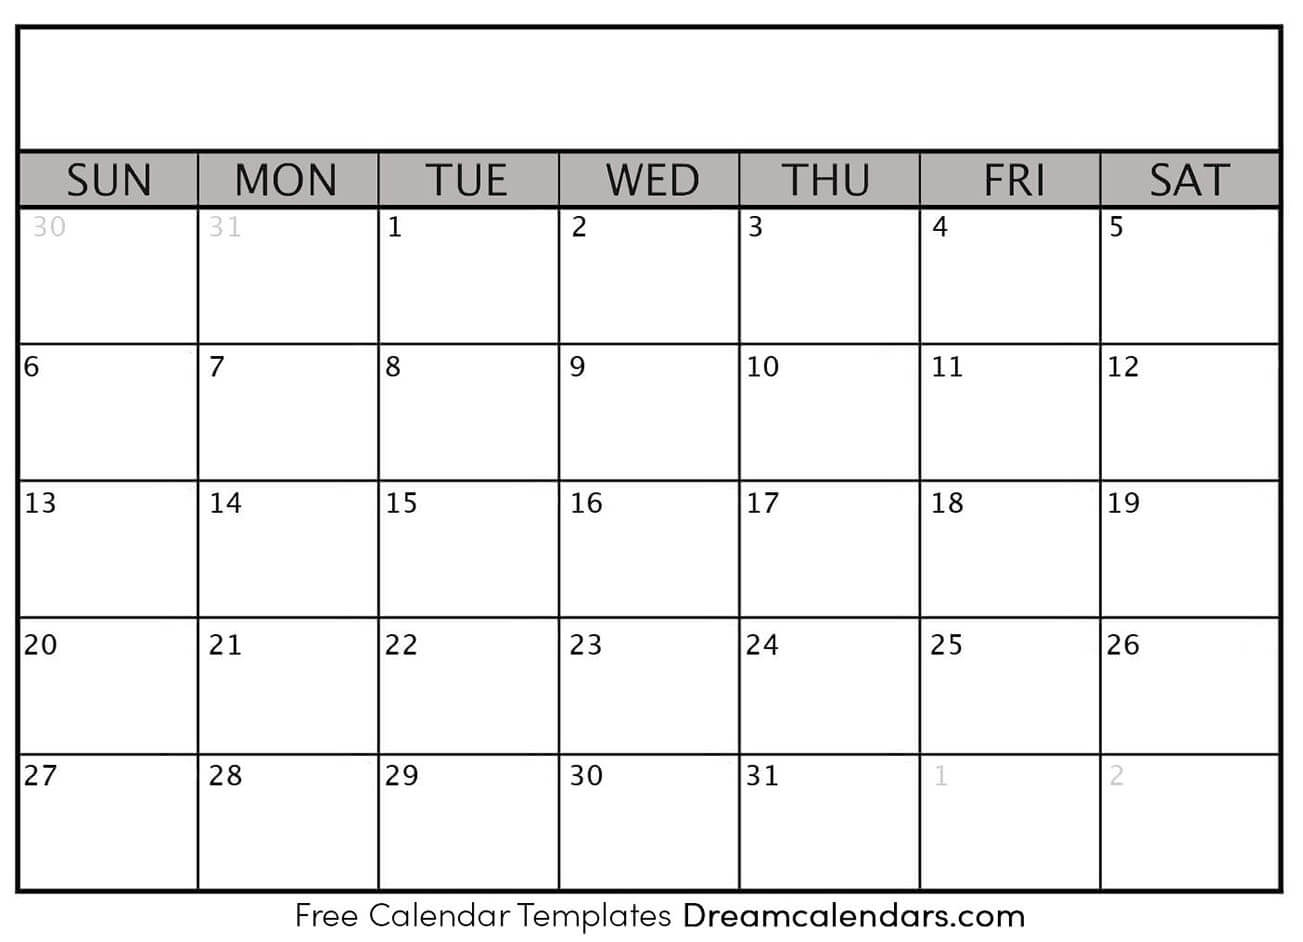 Printable Blank Calendar 2020 | Dream Calendars regarding Calendar With Lots Of Space To Write 2020